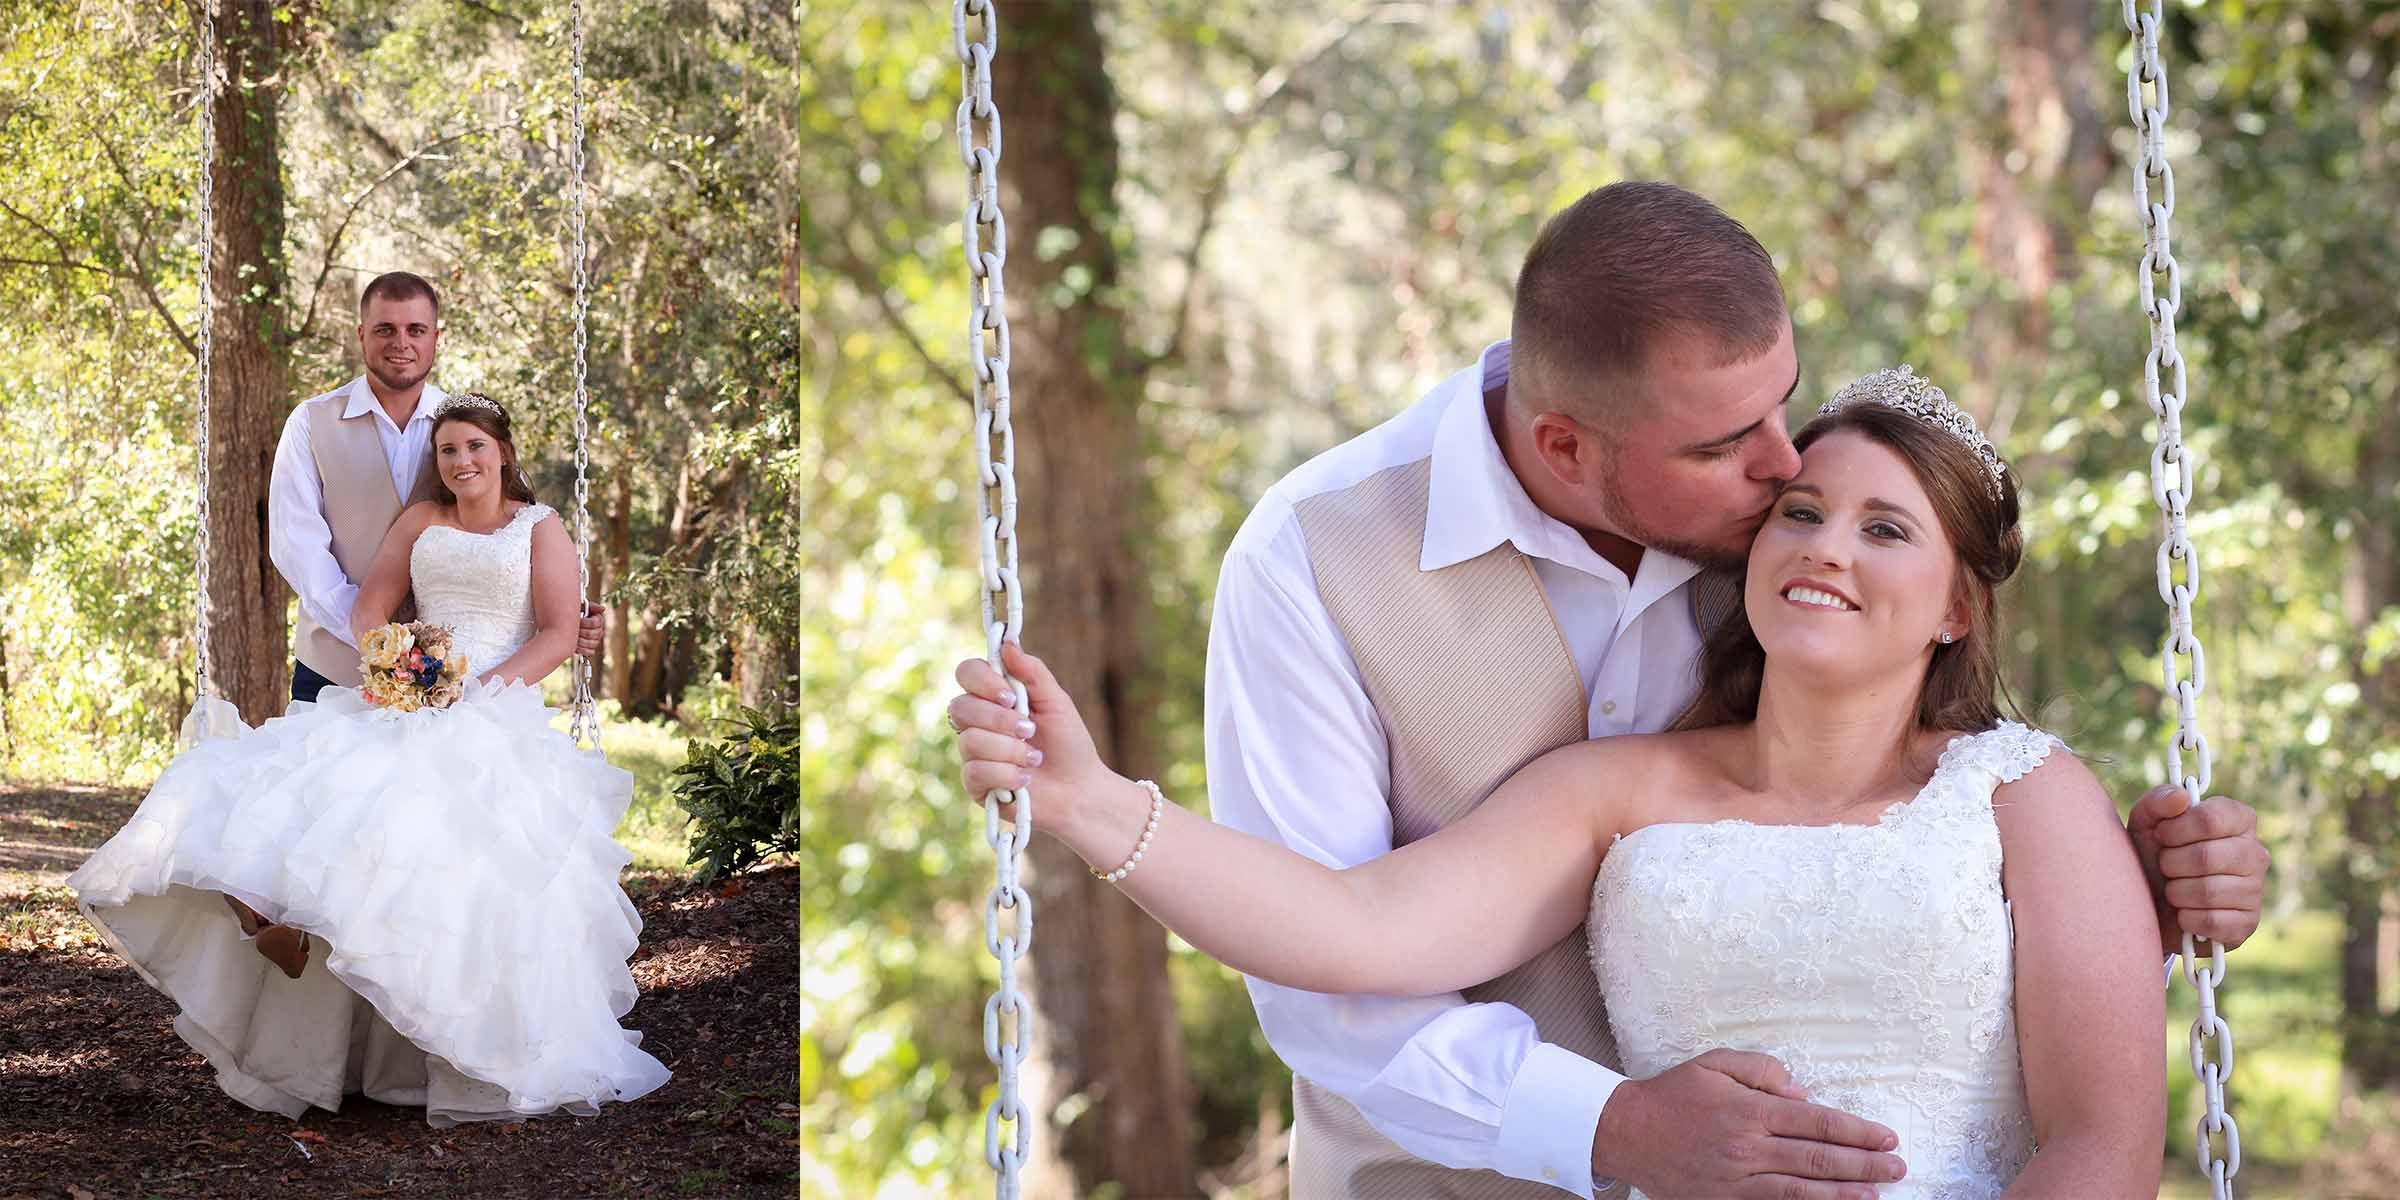 Tallahassee Wedding Photographer   Renee Dawkins.jpg